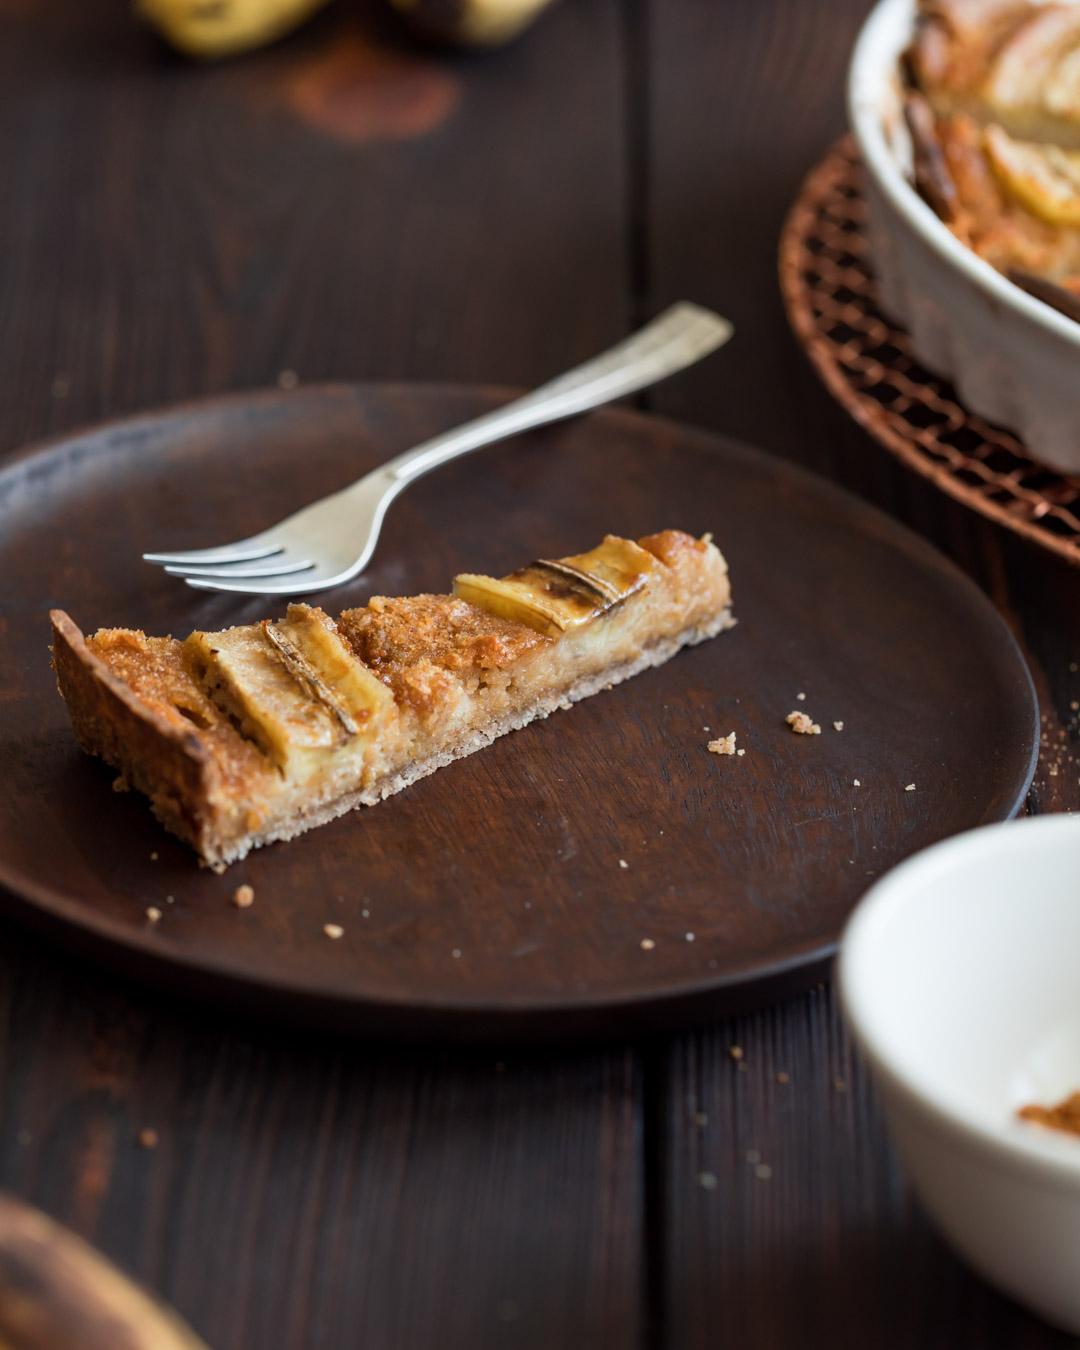 Vegan Gluten-free Banana Tart